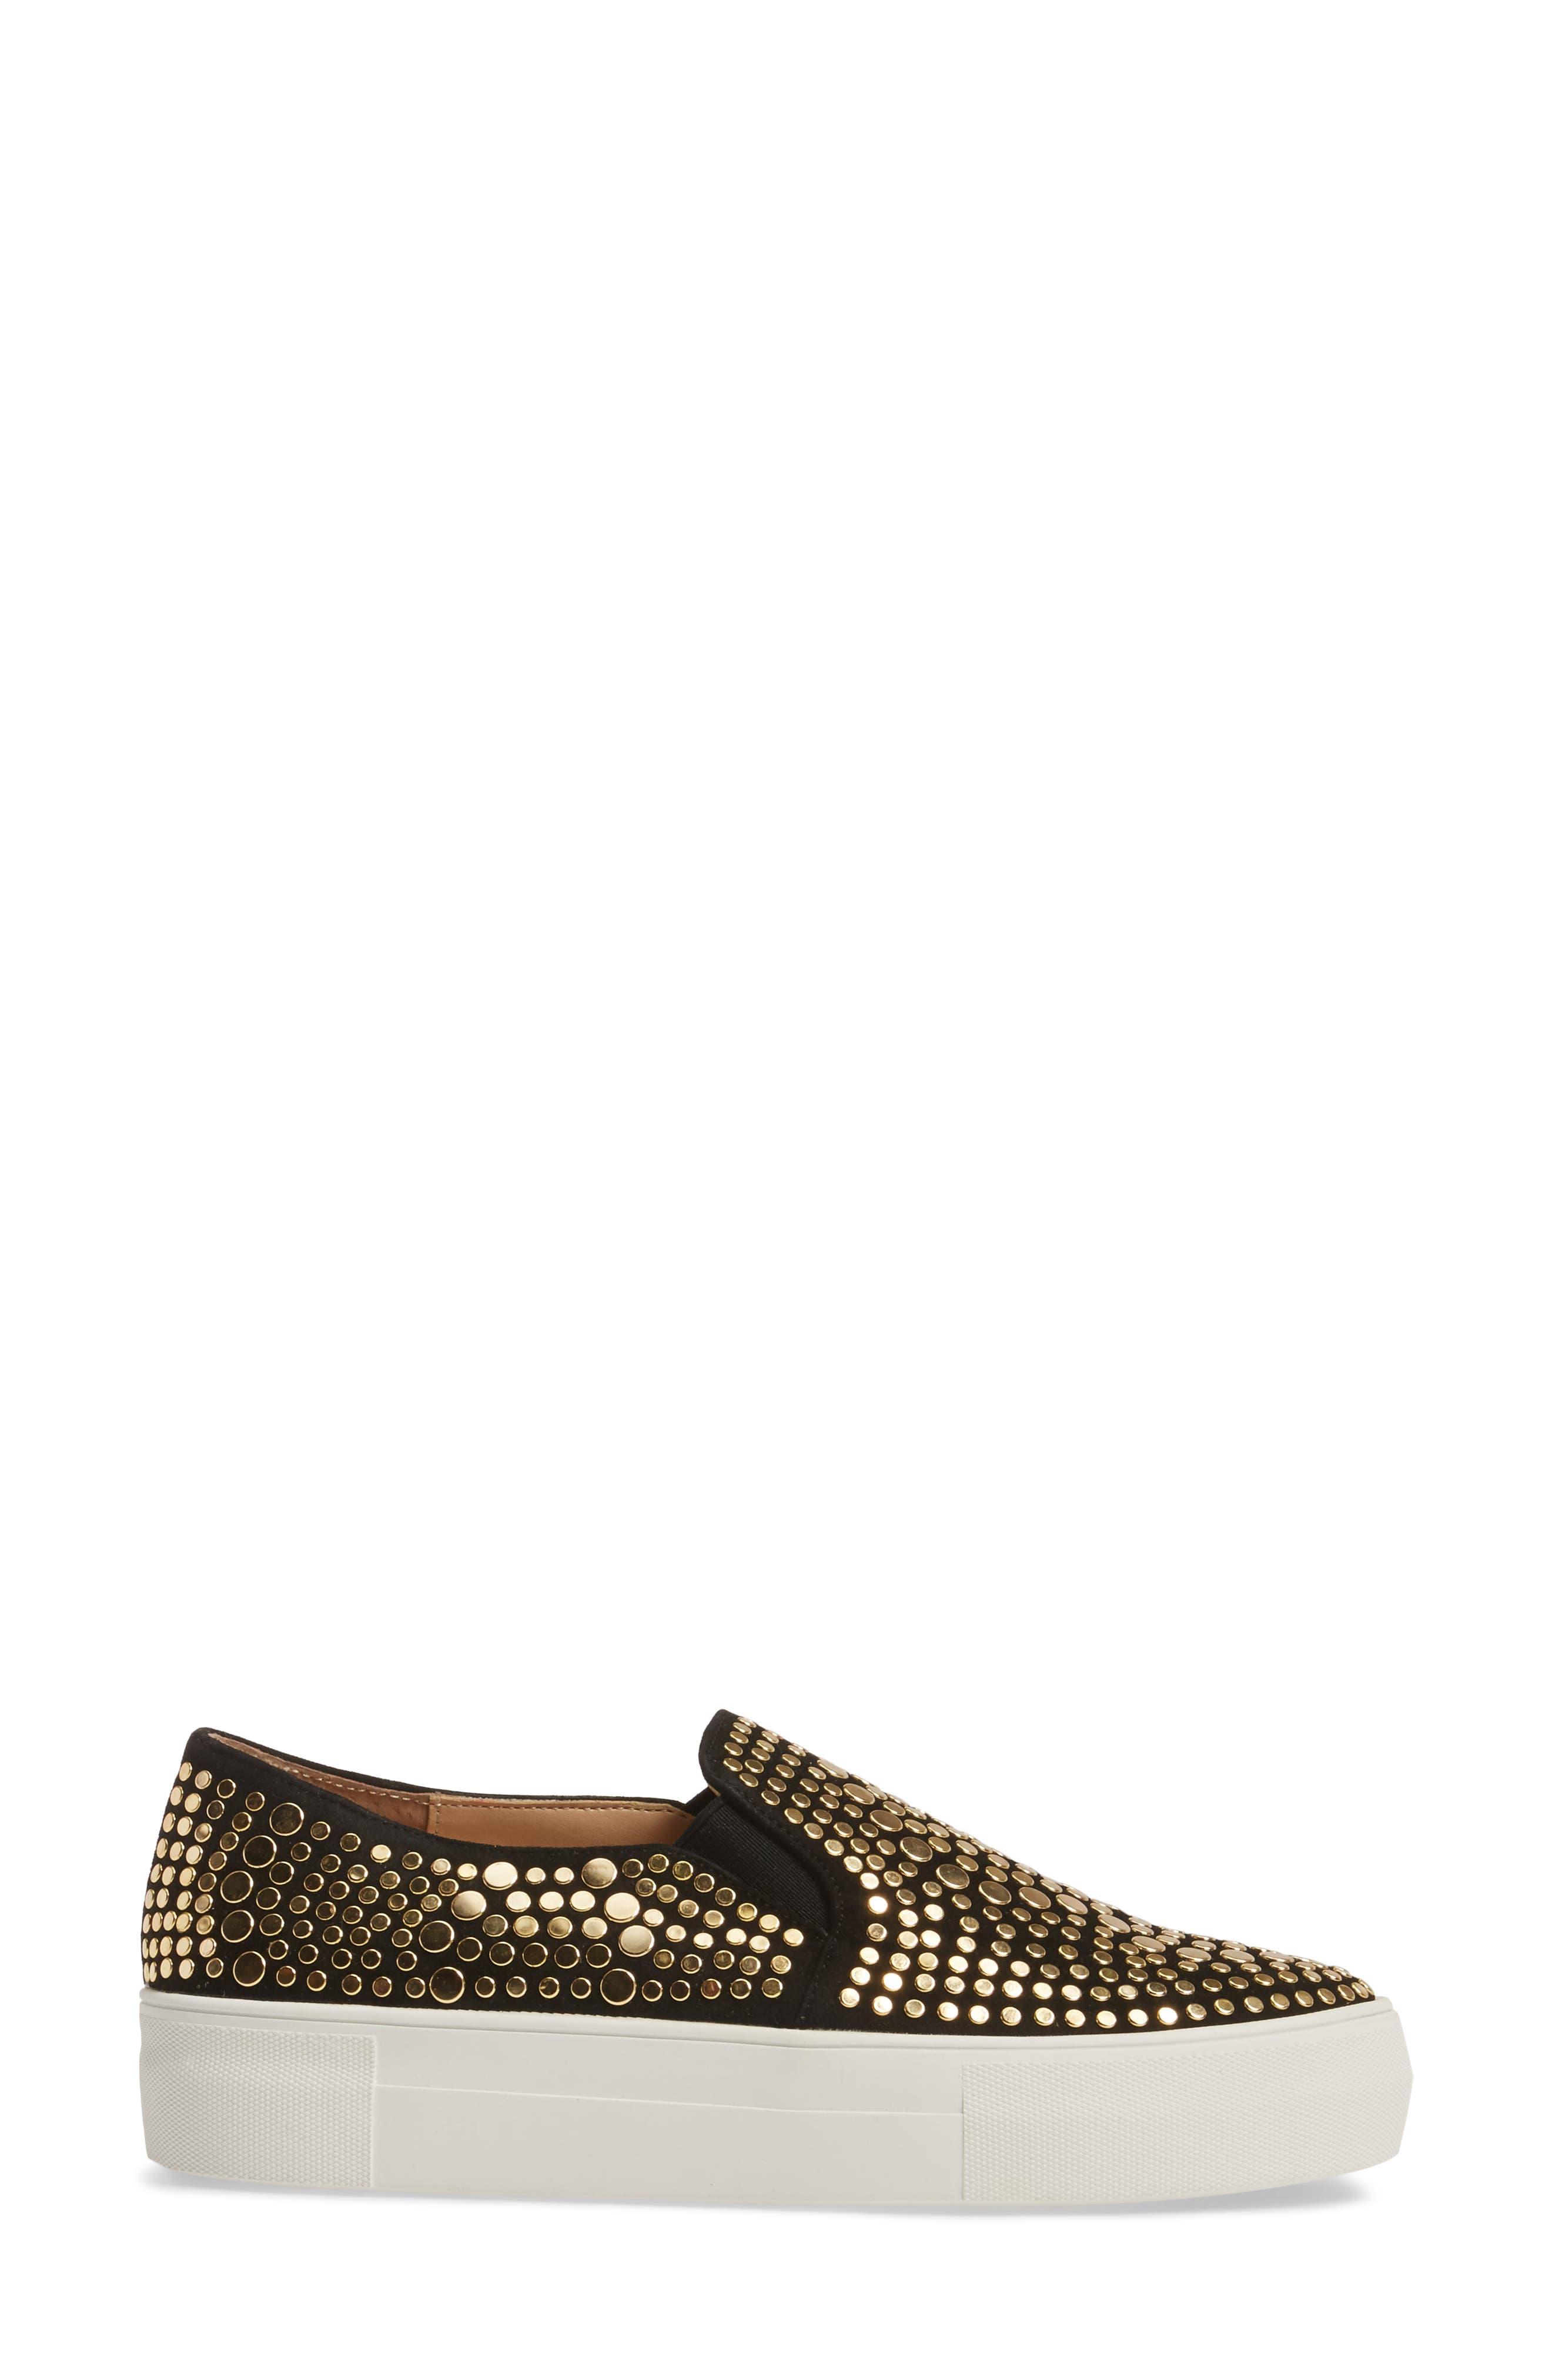 Alternate Image 3  - Vince Camuto Kindra Stud Slip-On Sneaker (Women)